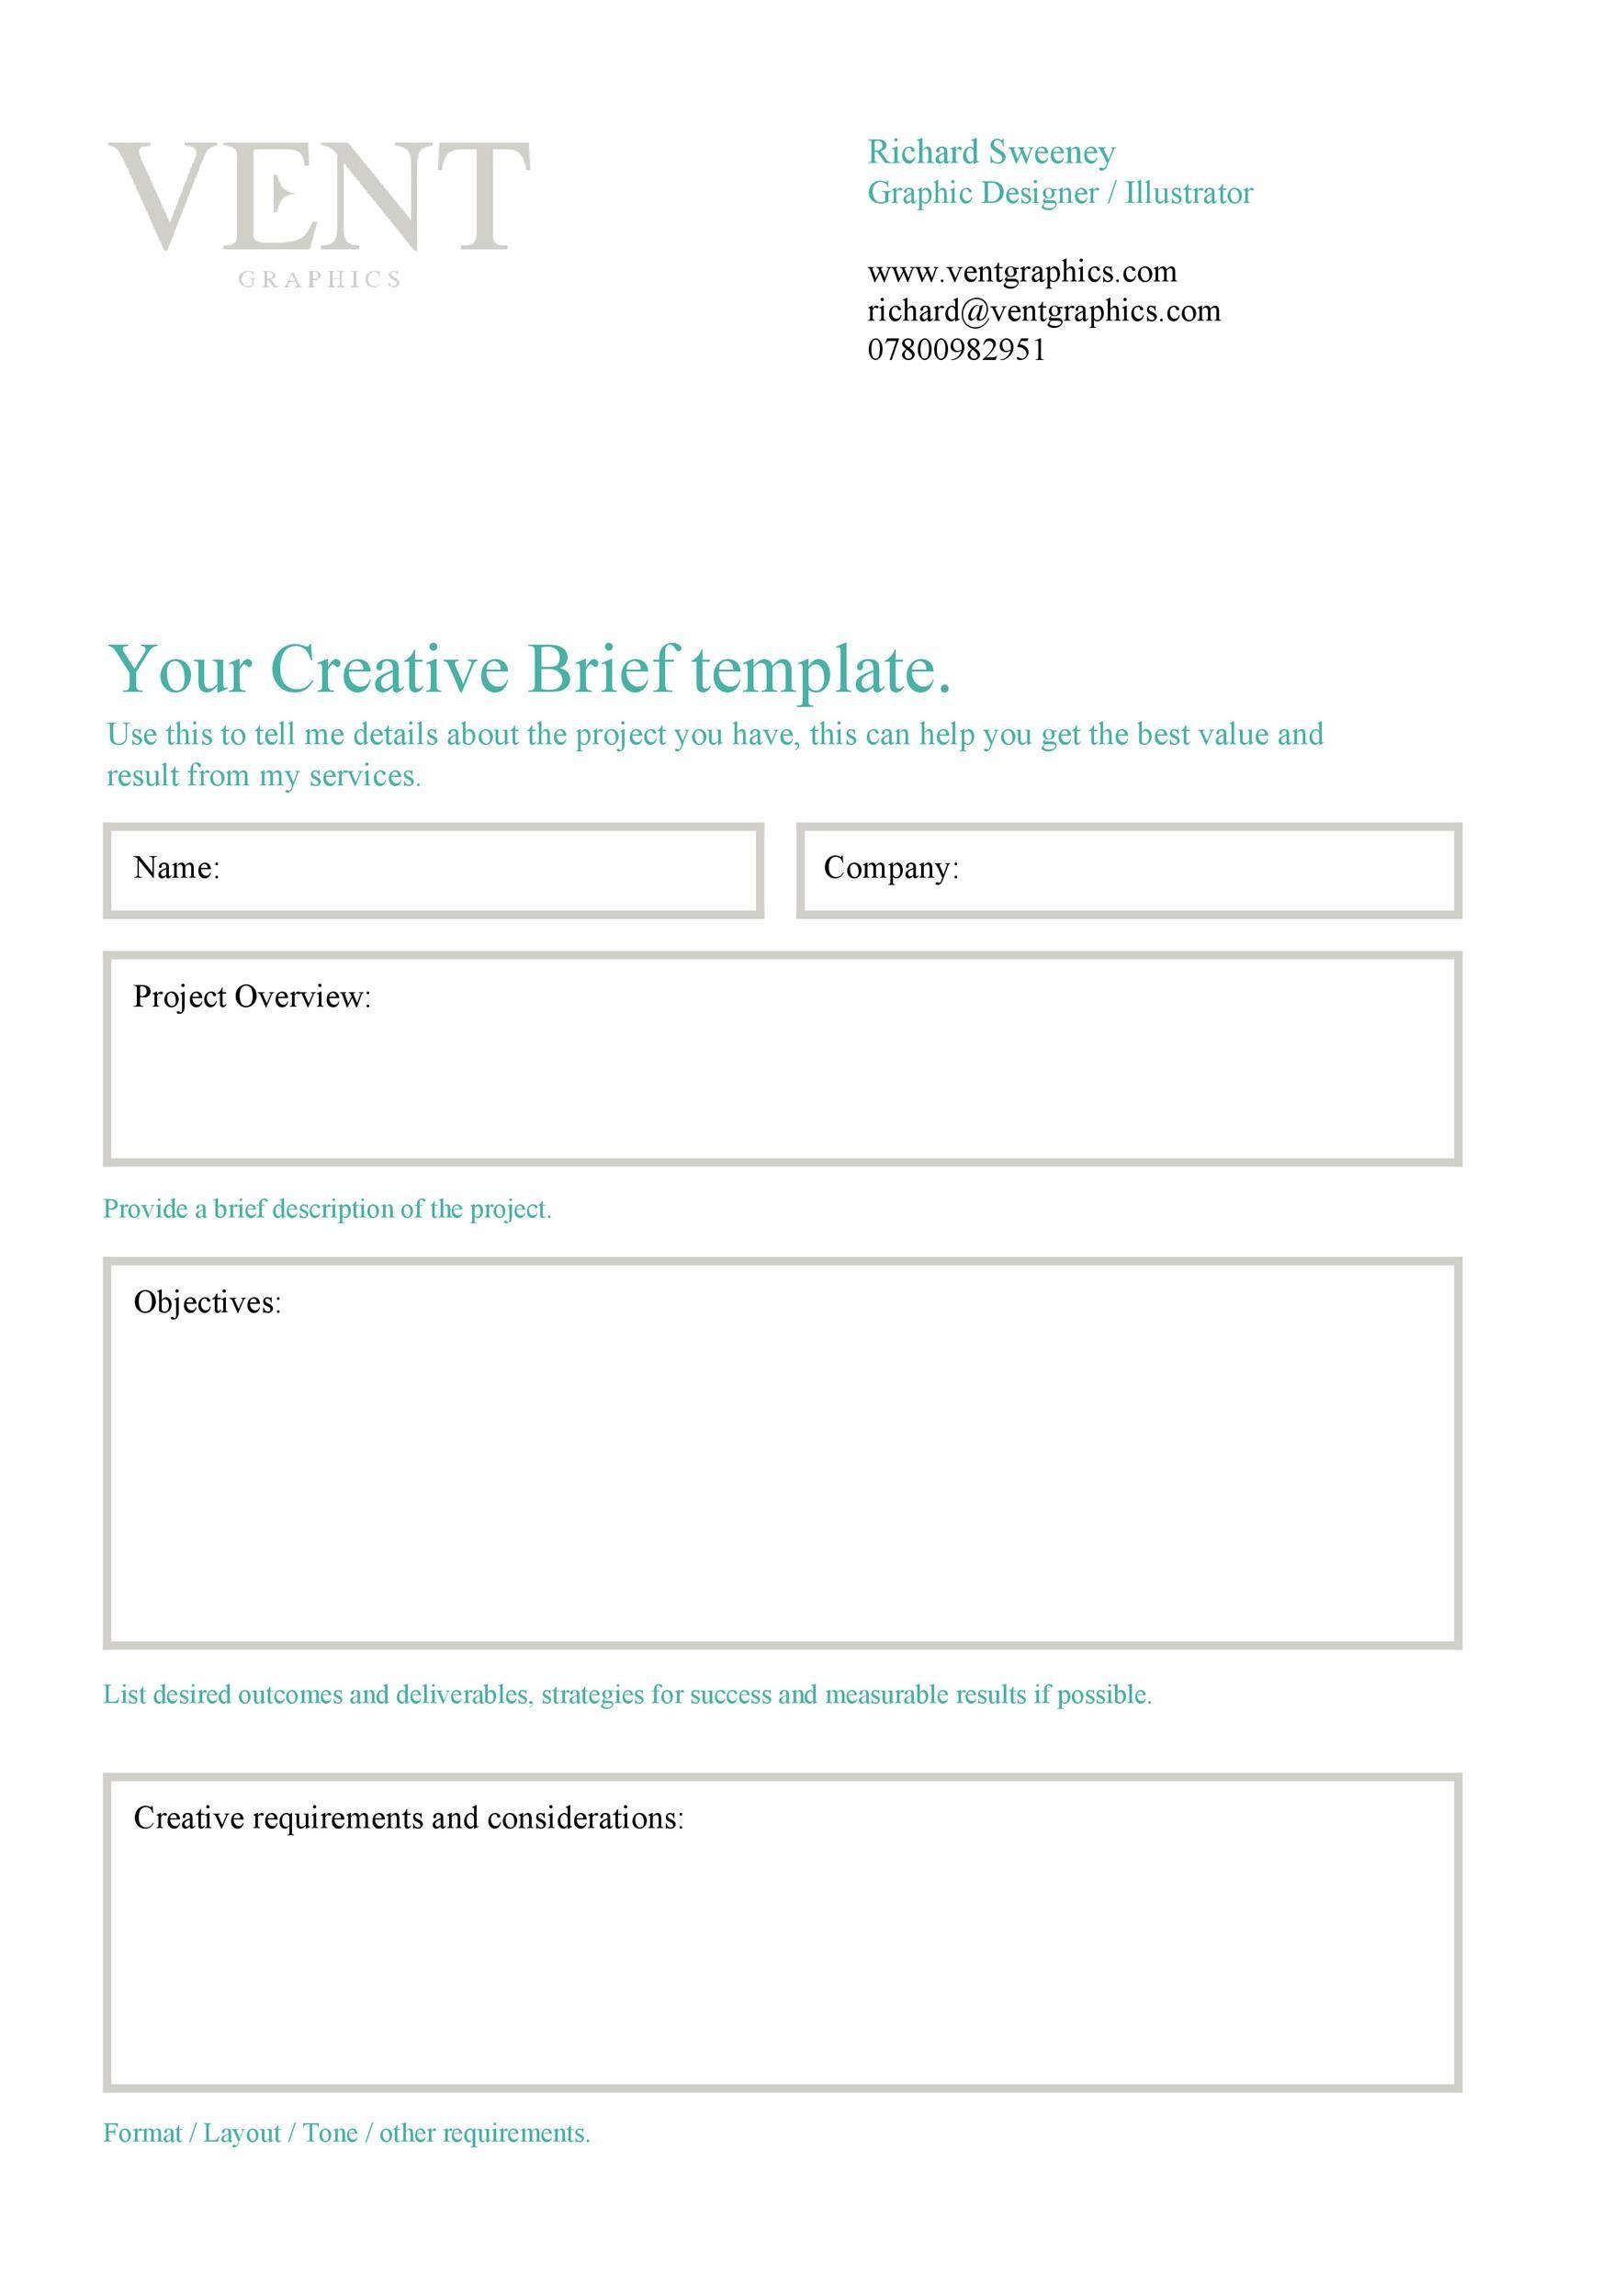 Free design brief template 09